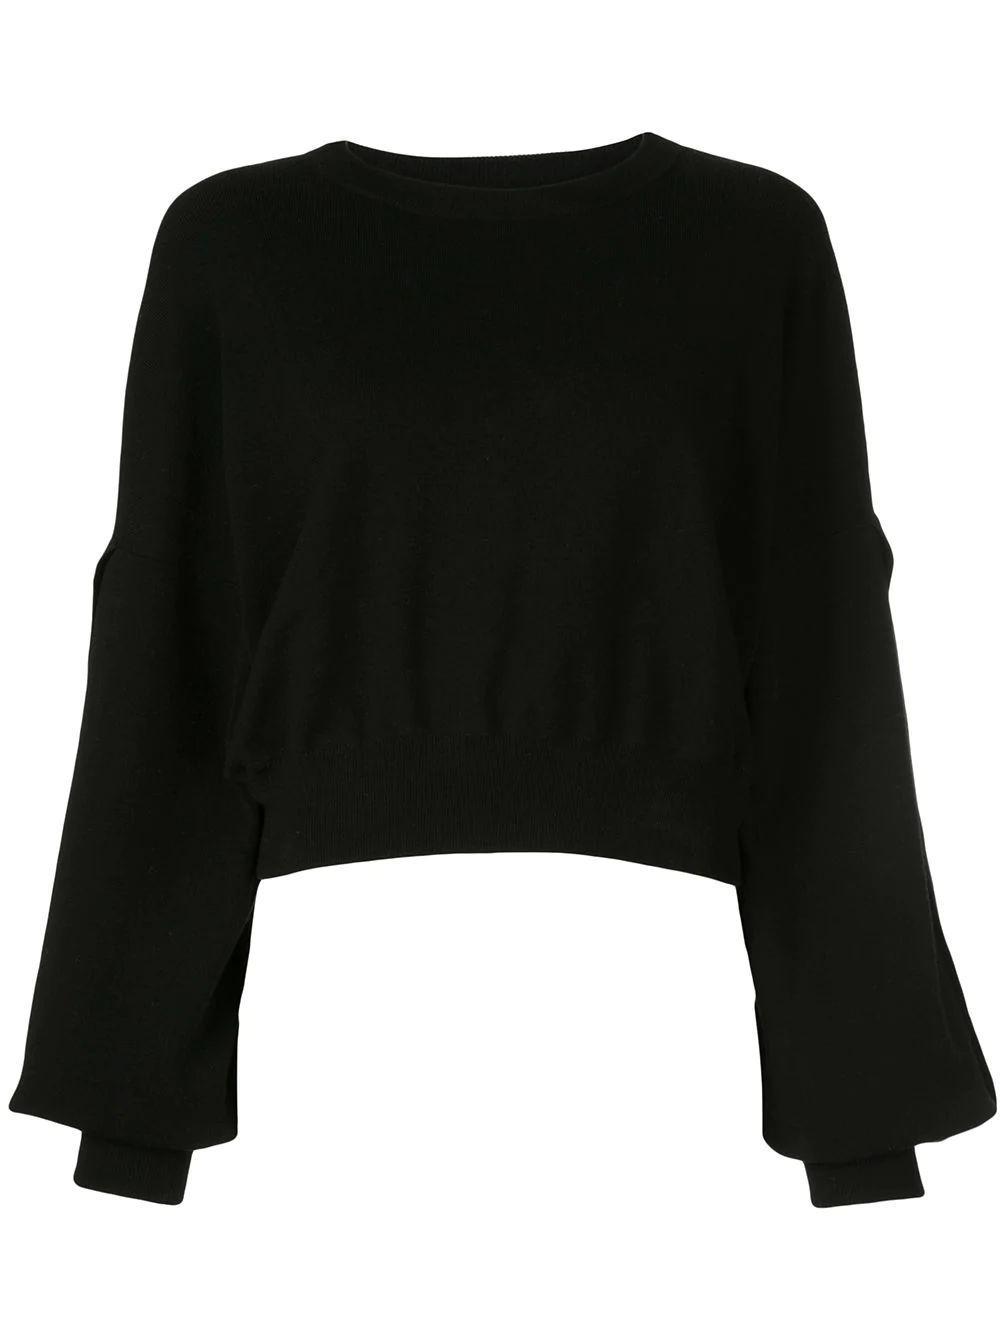 Marie Dolman Sleeve Crop Pullover Item # CC908539702